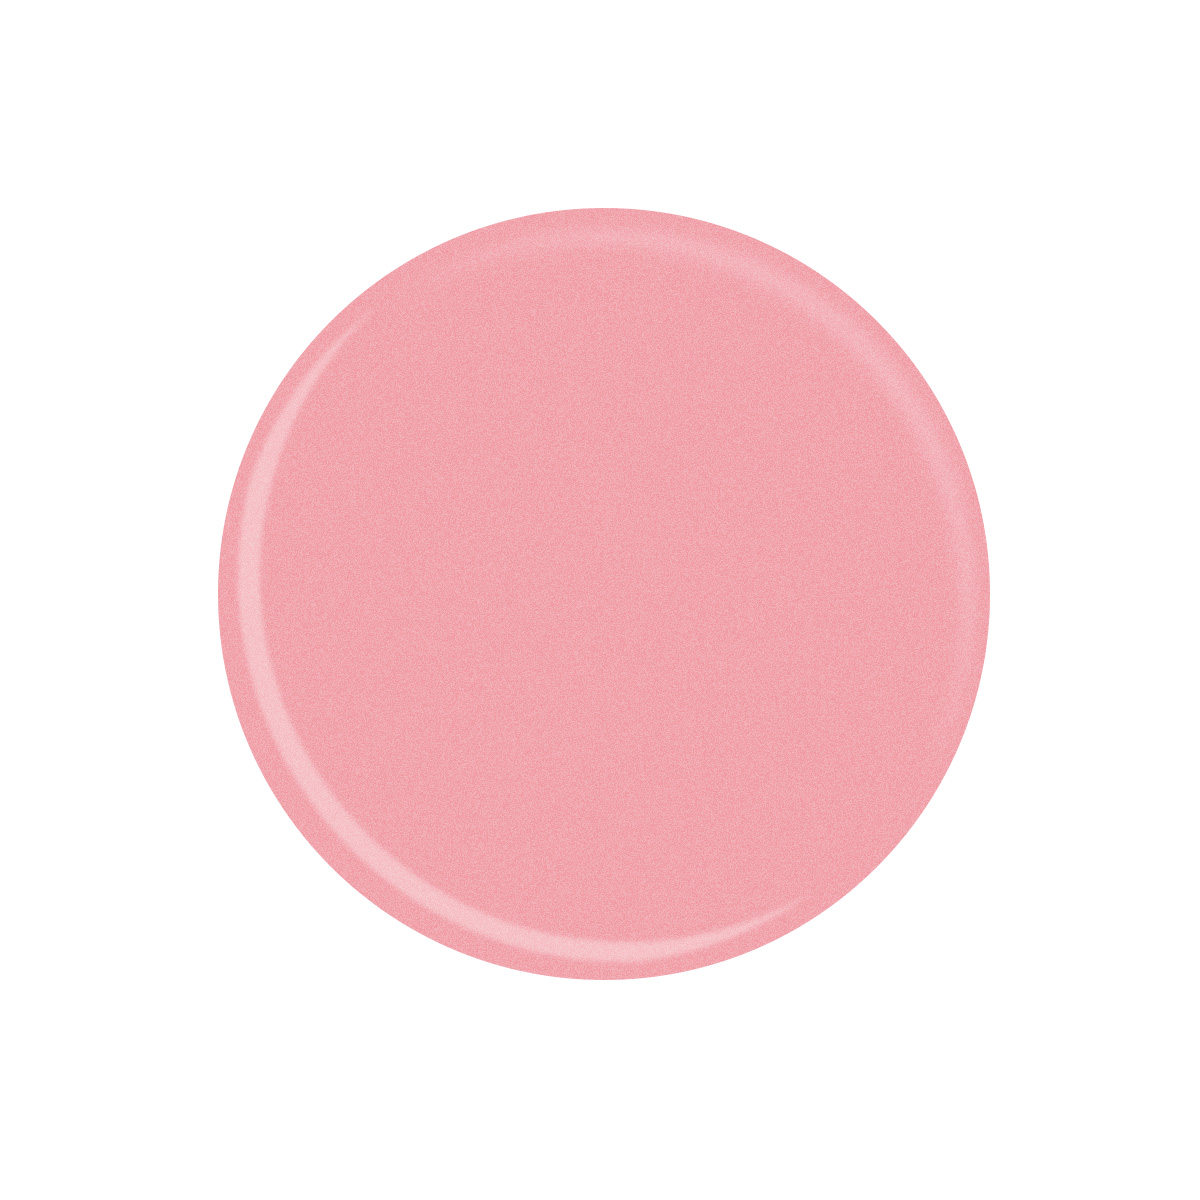 JESSICA Nail Colour Peony